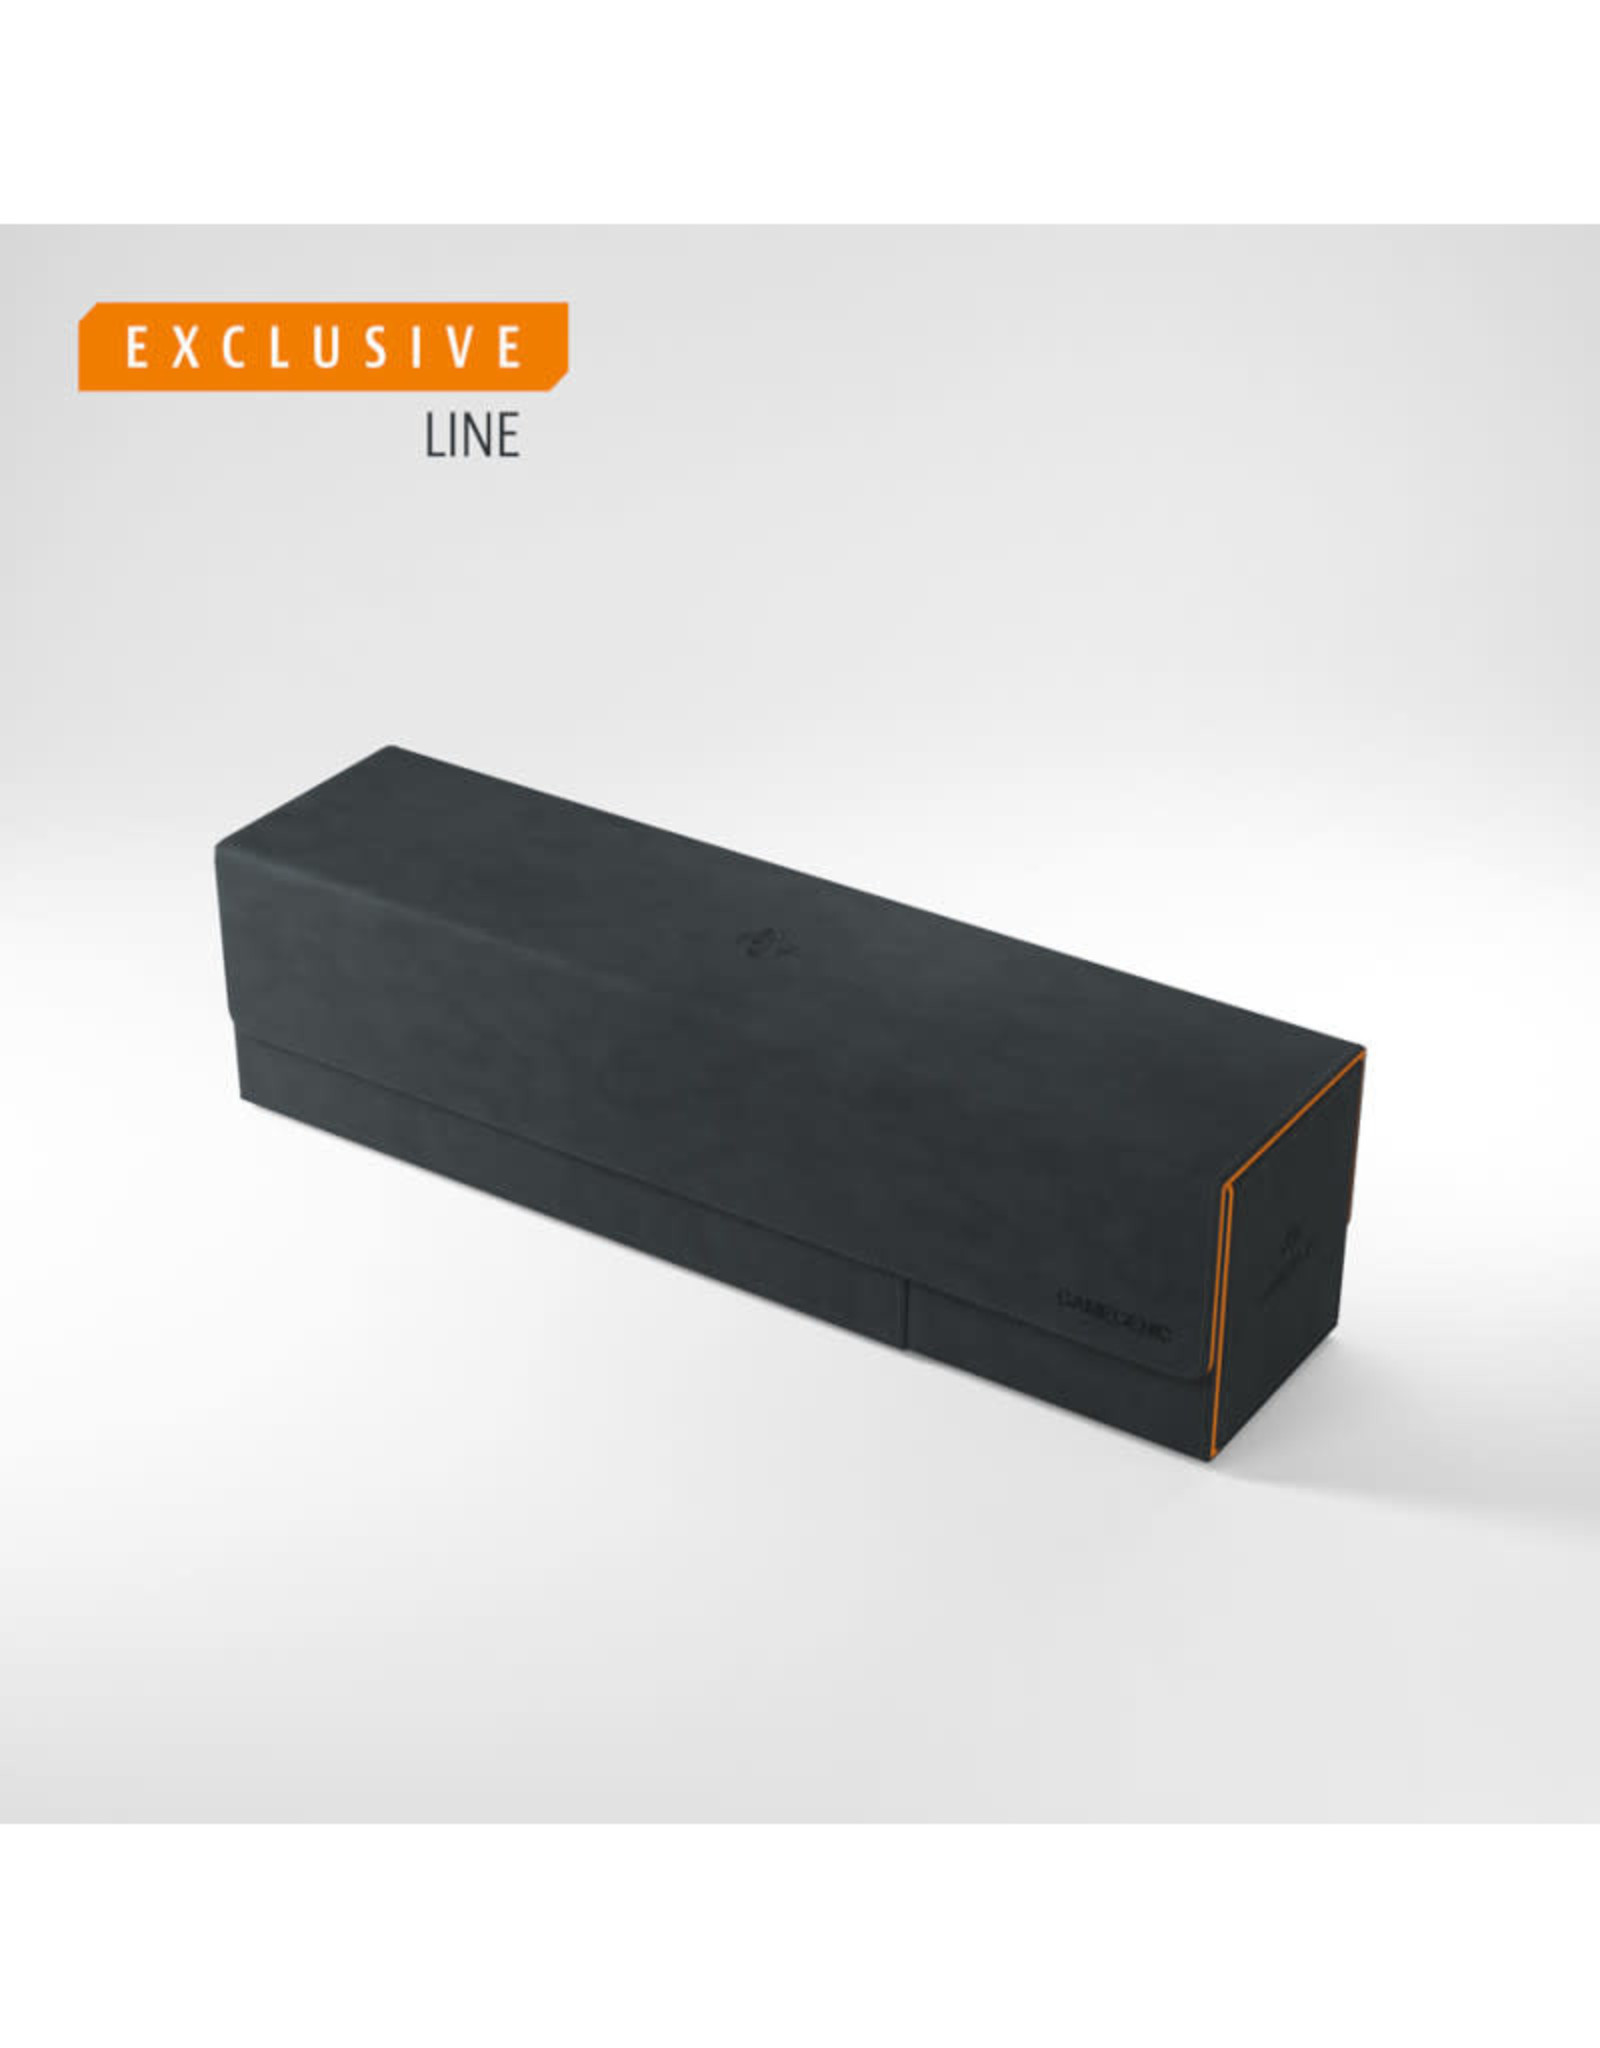 GameGenic Card's Lair 400+ Black/Orange (Pre-Order)